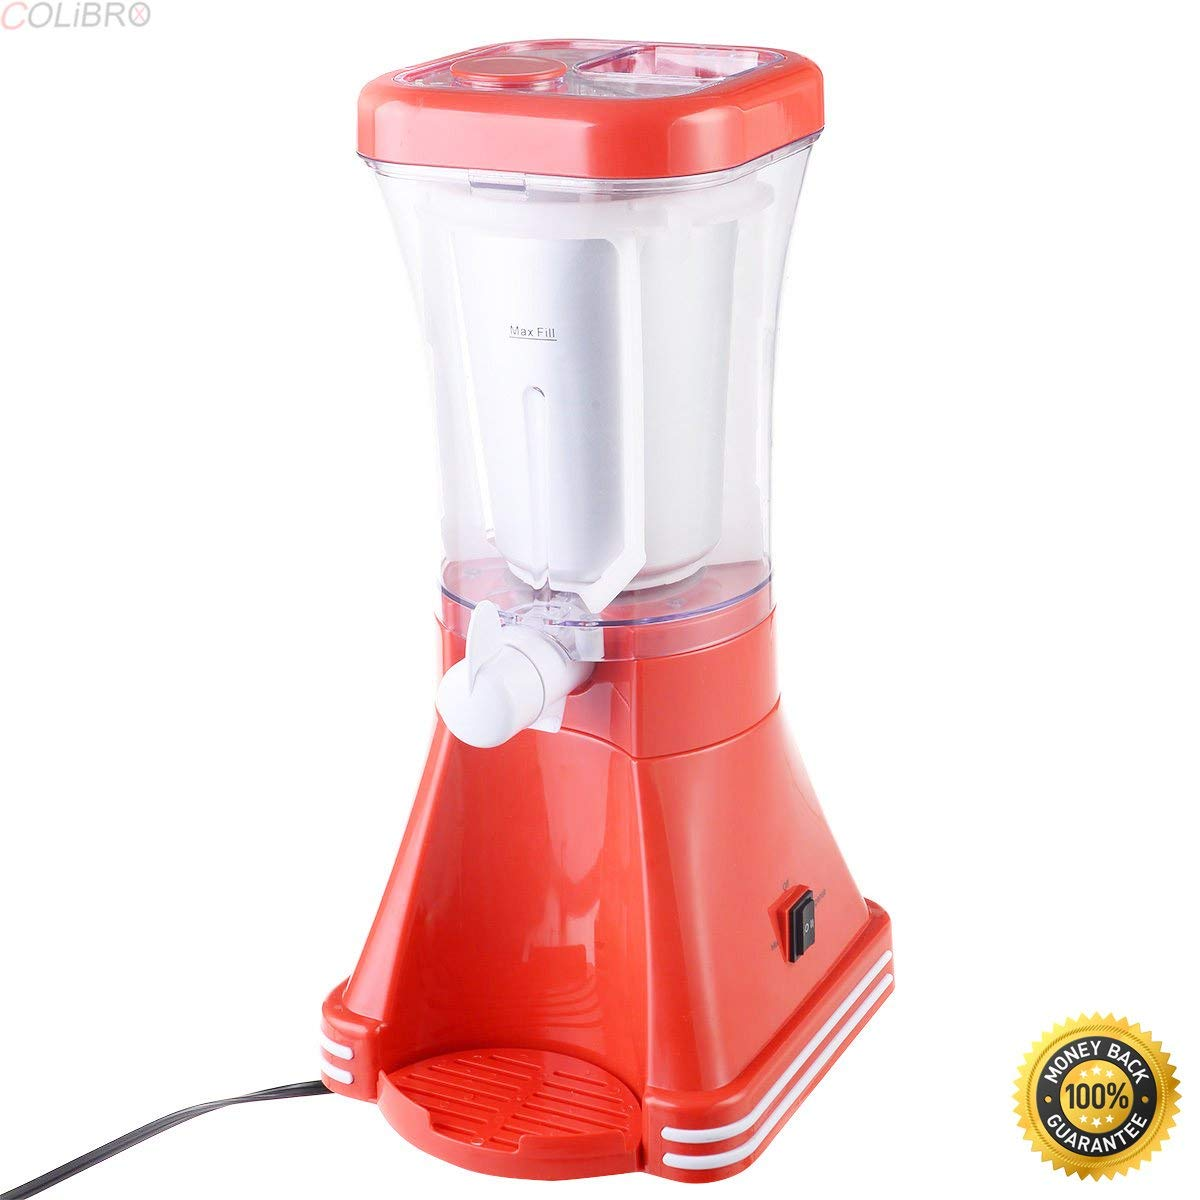 COLIBROX--New Slush Drink Maker Retro Machine Blender Ice Slushie Margarita Slurpee Frozen,drink maker machine,cocktail maker machine,alcohol drink maker machine,cocktail machine for sale